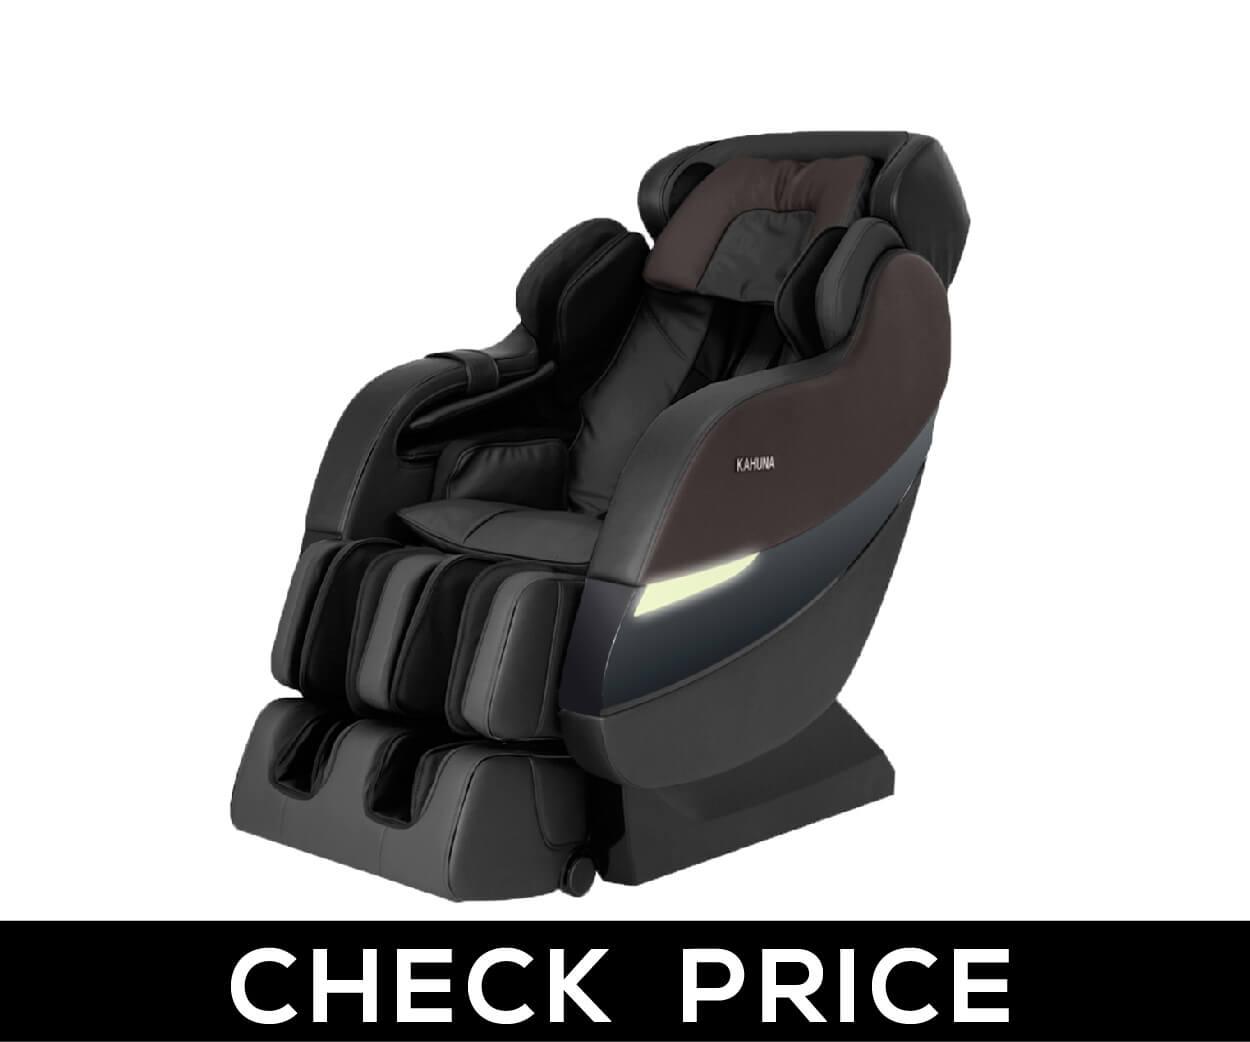 Kahuna SM-7300s Massage Chair